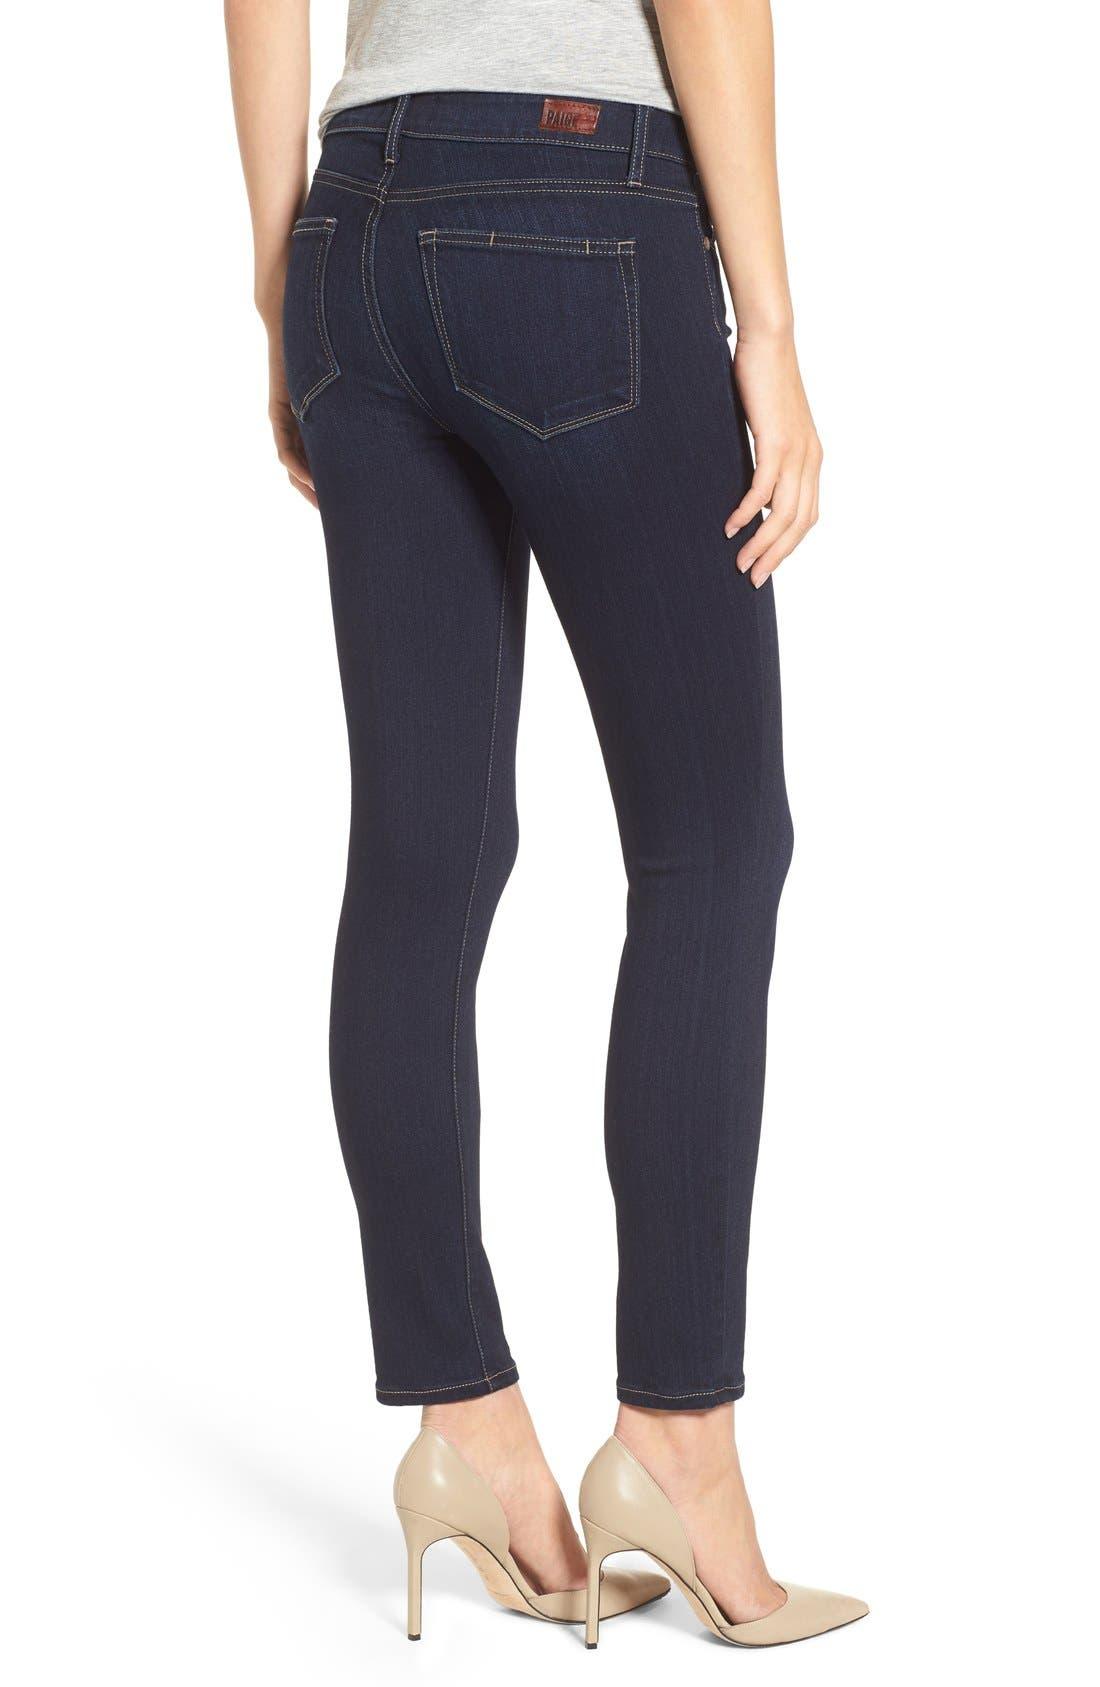 Alternate Image 3  - PAIGE 'Transcend - Verdugo' Ankle Skinny Jeans (Tari)